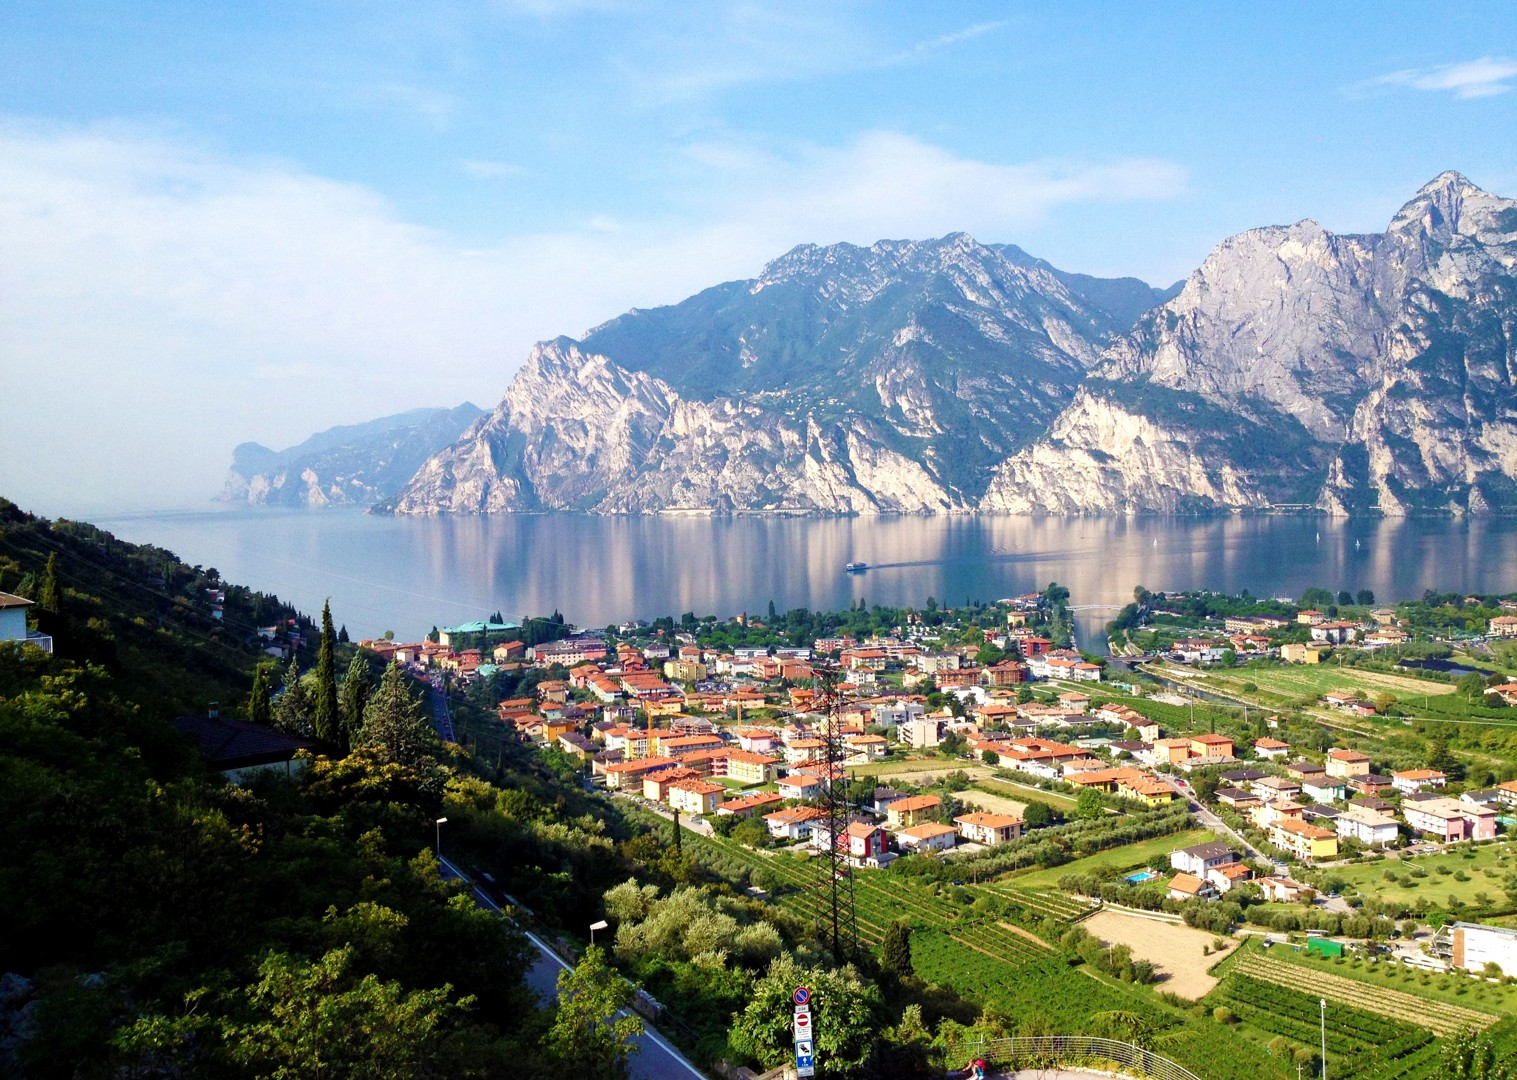 explore-merano-cycling-trip-italy.jpg - Italy - La Via Claudia - Self-Guided Leisure Cycling Holiday - Leisure Cycling